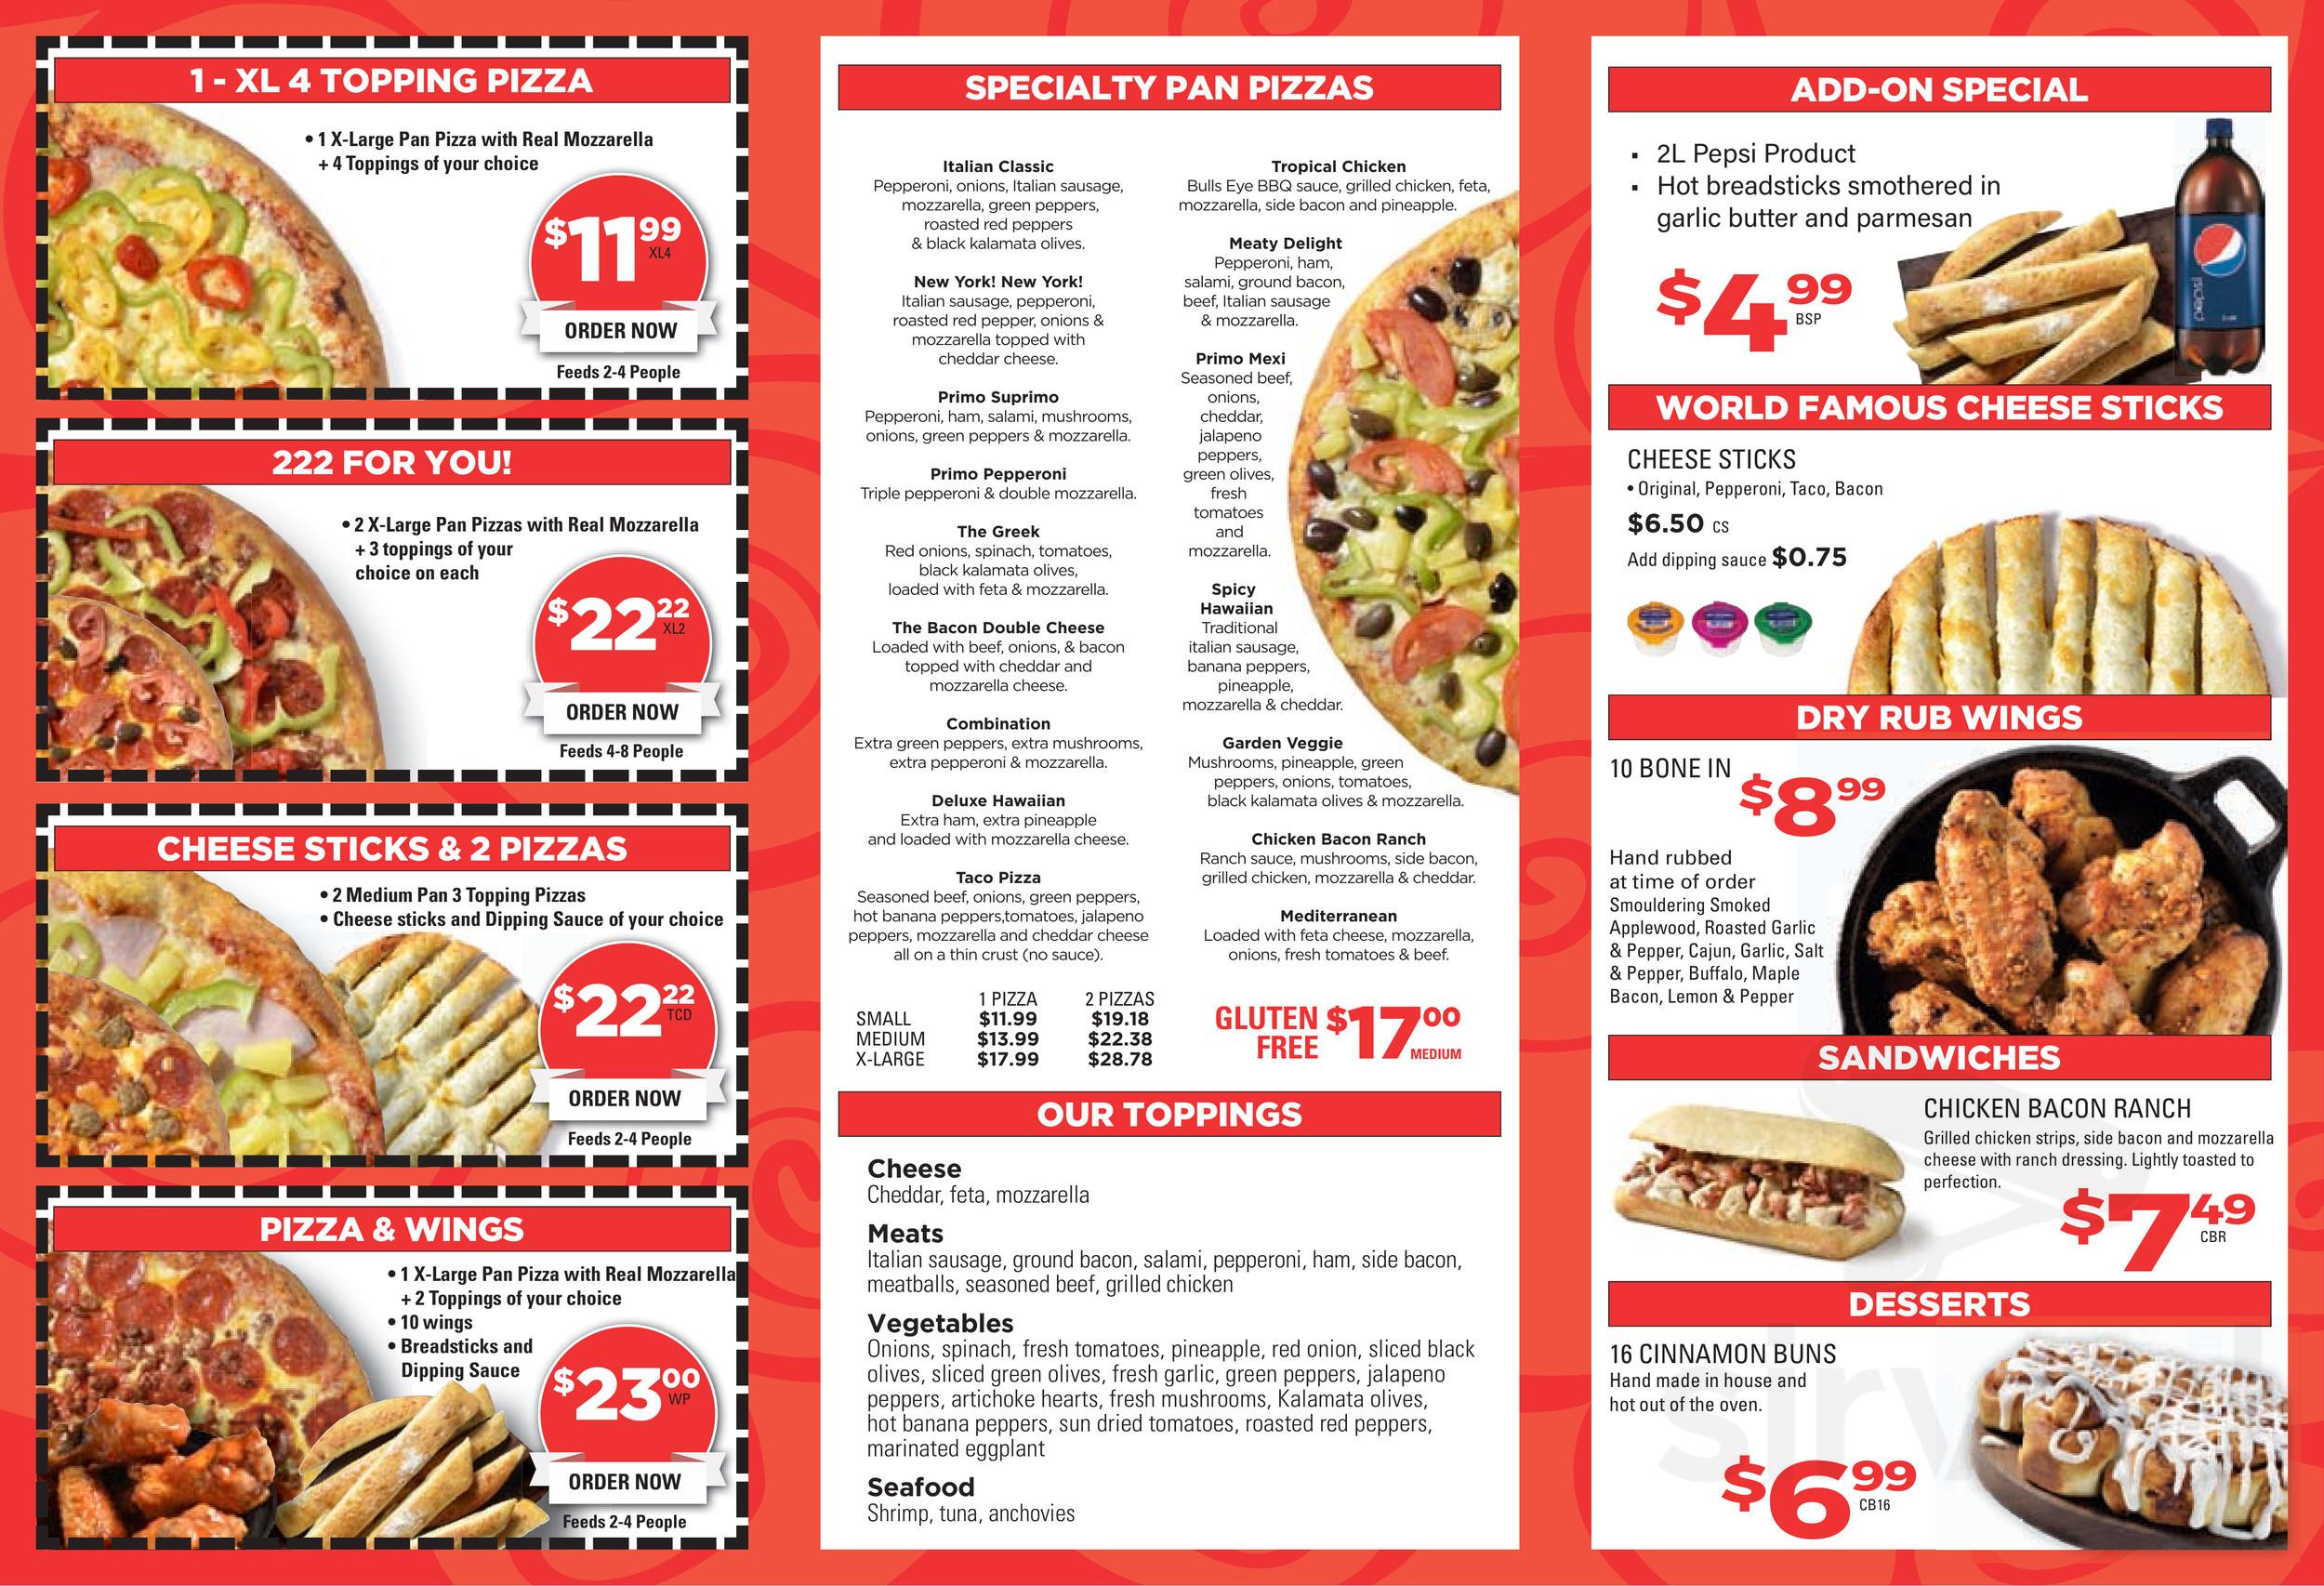 Chinese lantern festival fair park coupons - Pizza Hotline Coupons Winnipeg